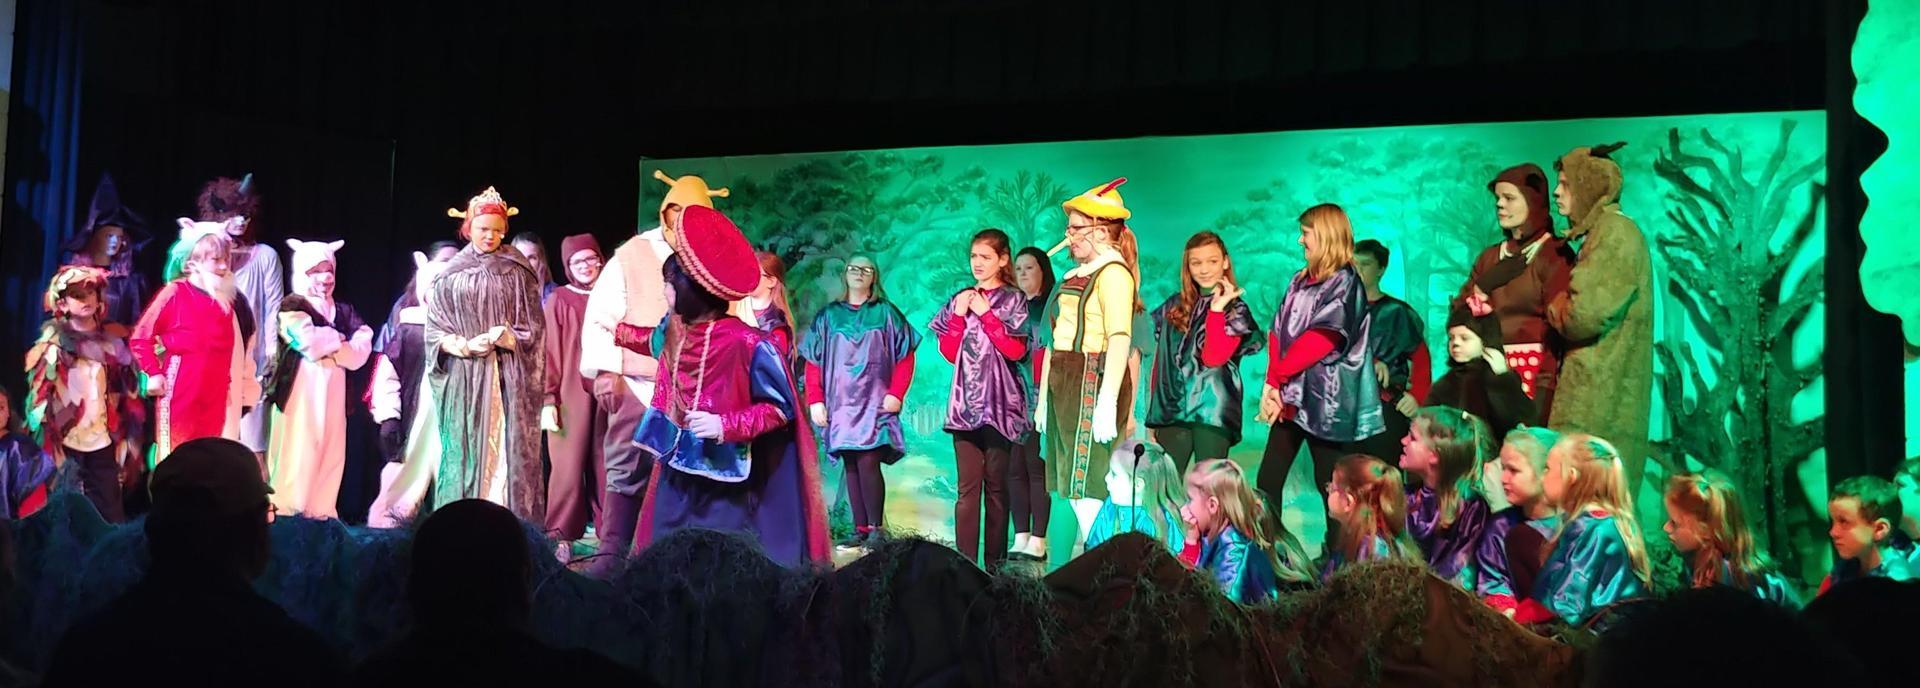 Children's Theater's Production of 'Shrek The Musical Jr.' in January 2018.